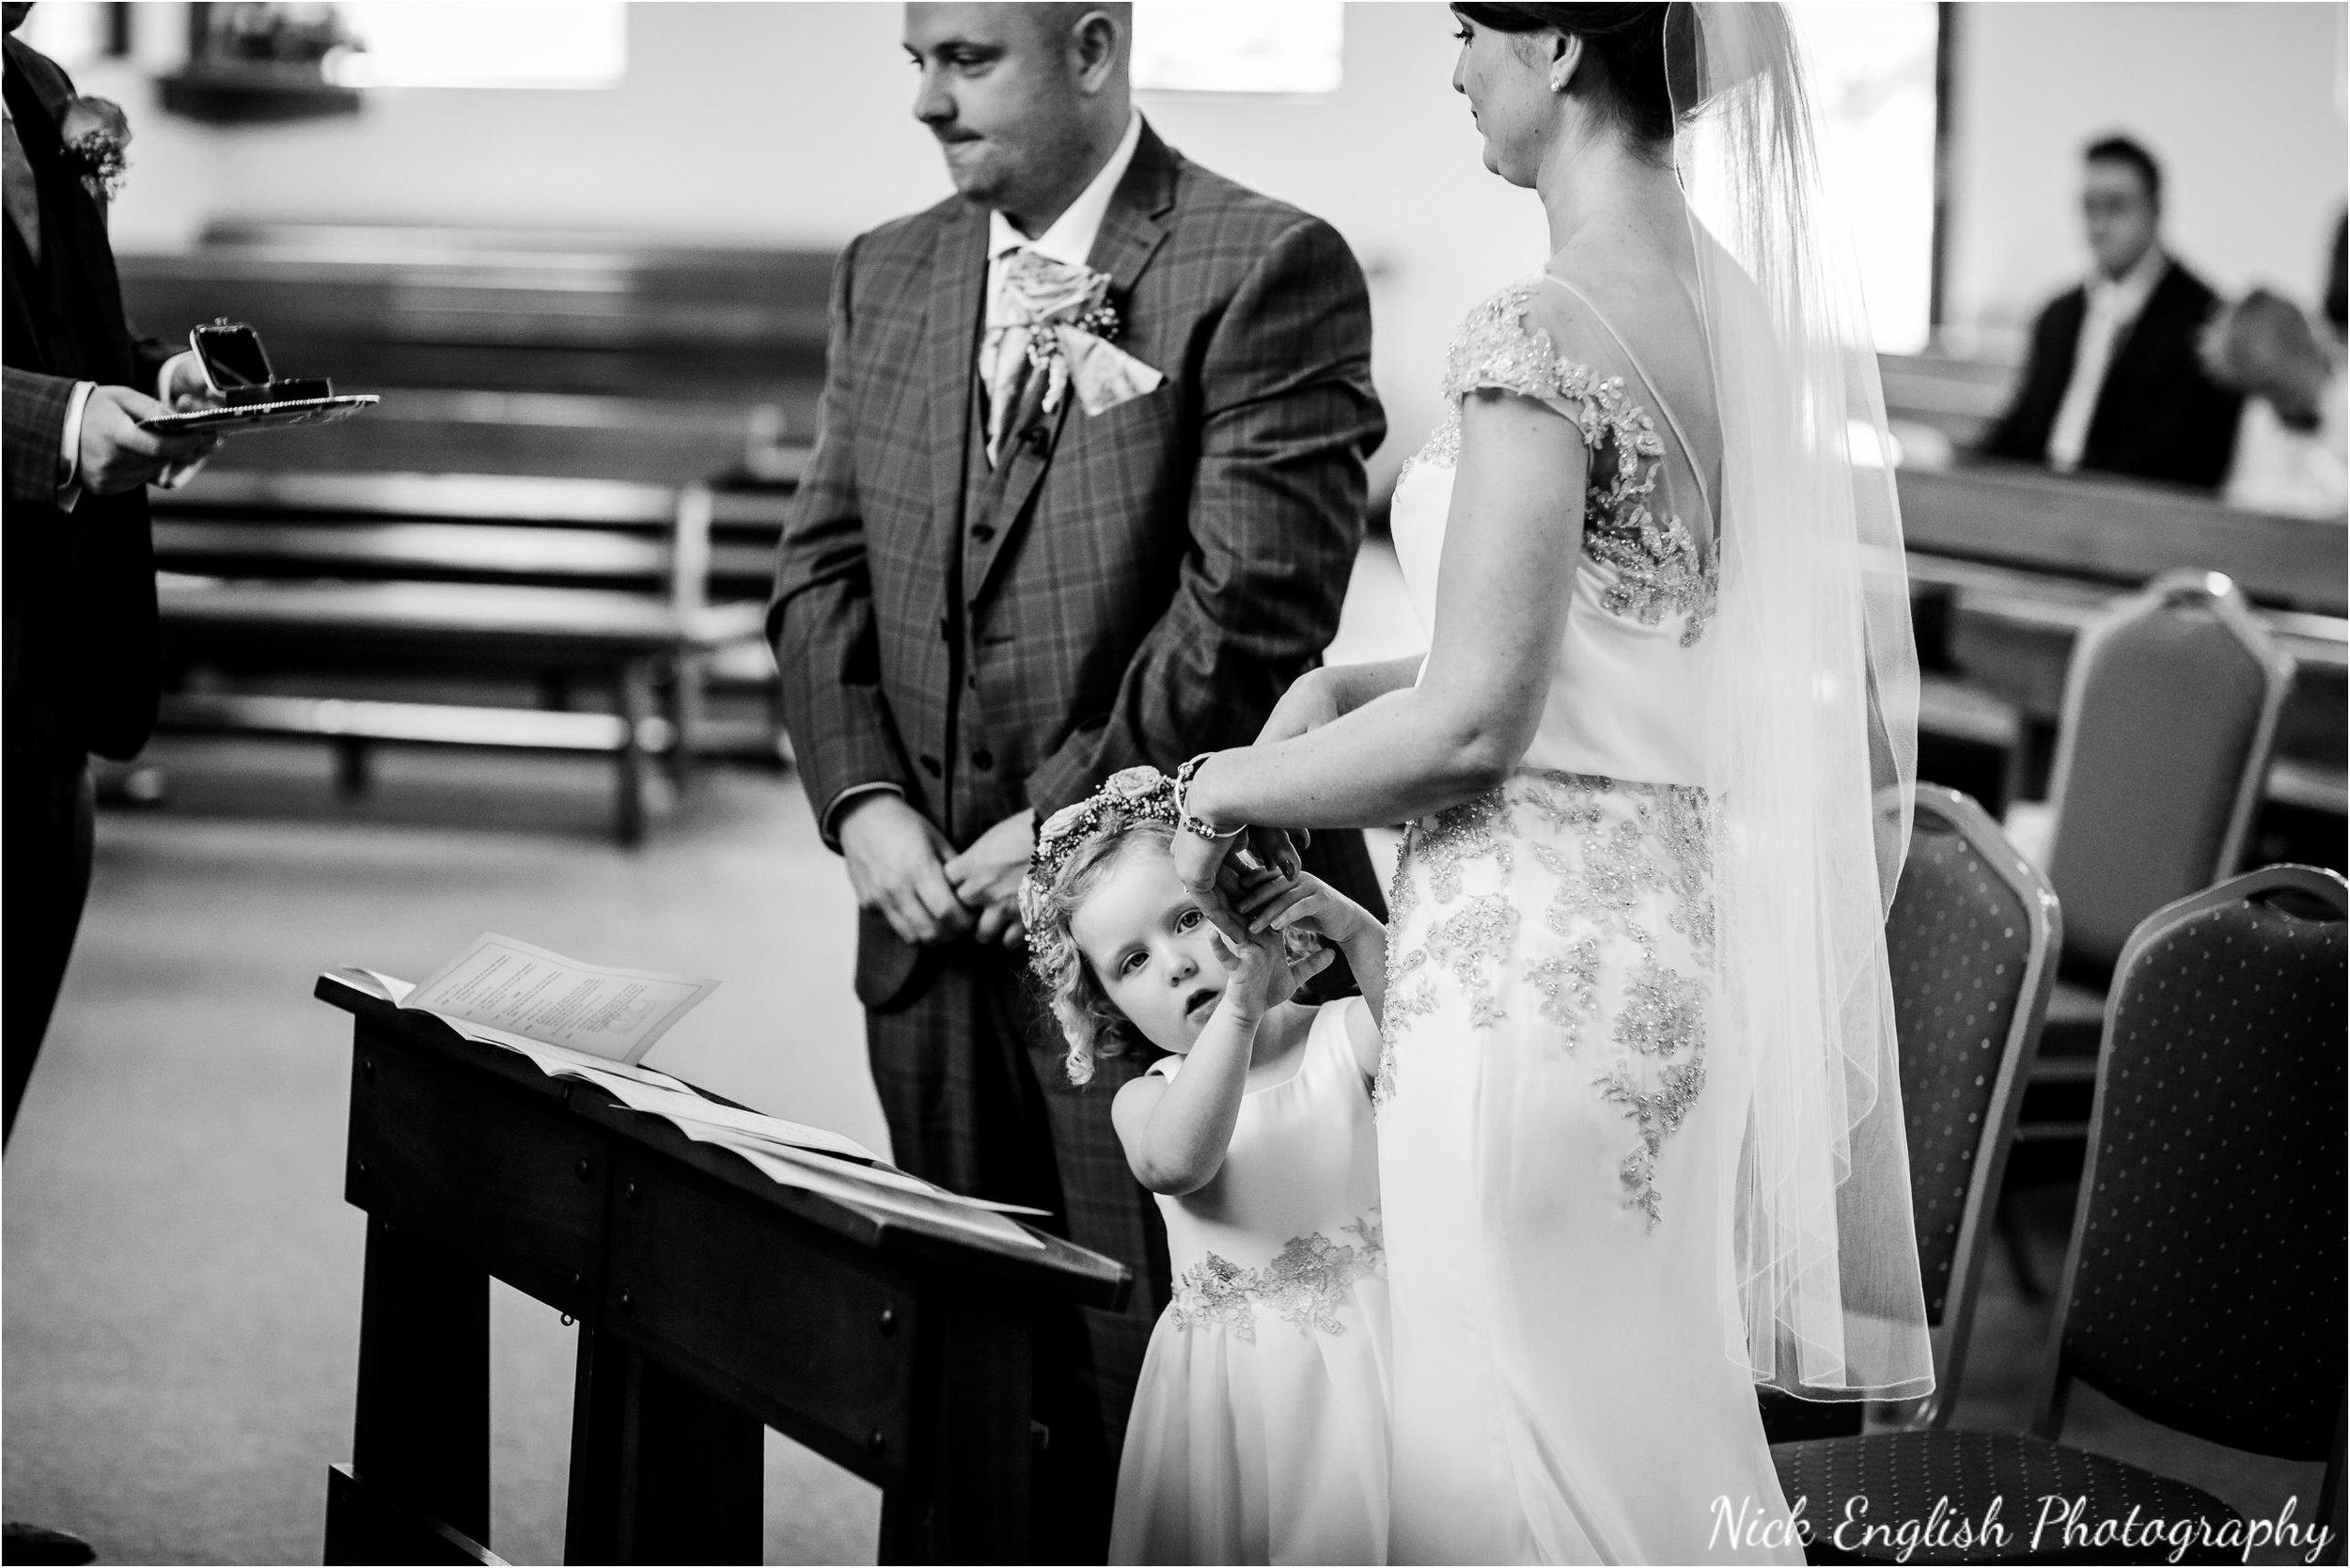 Stacey-Ash-Wedding-Photographs-Stanley-House-Preston-Lancashire-66.jpg